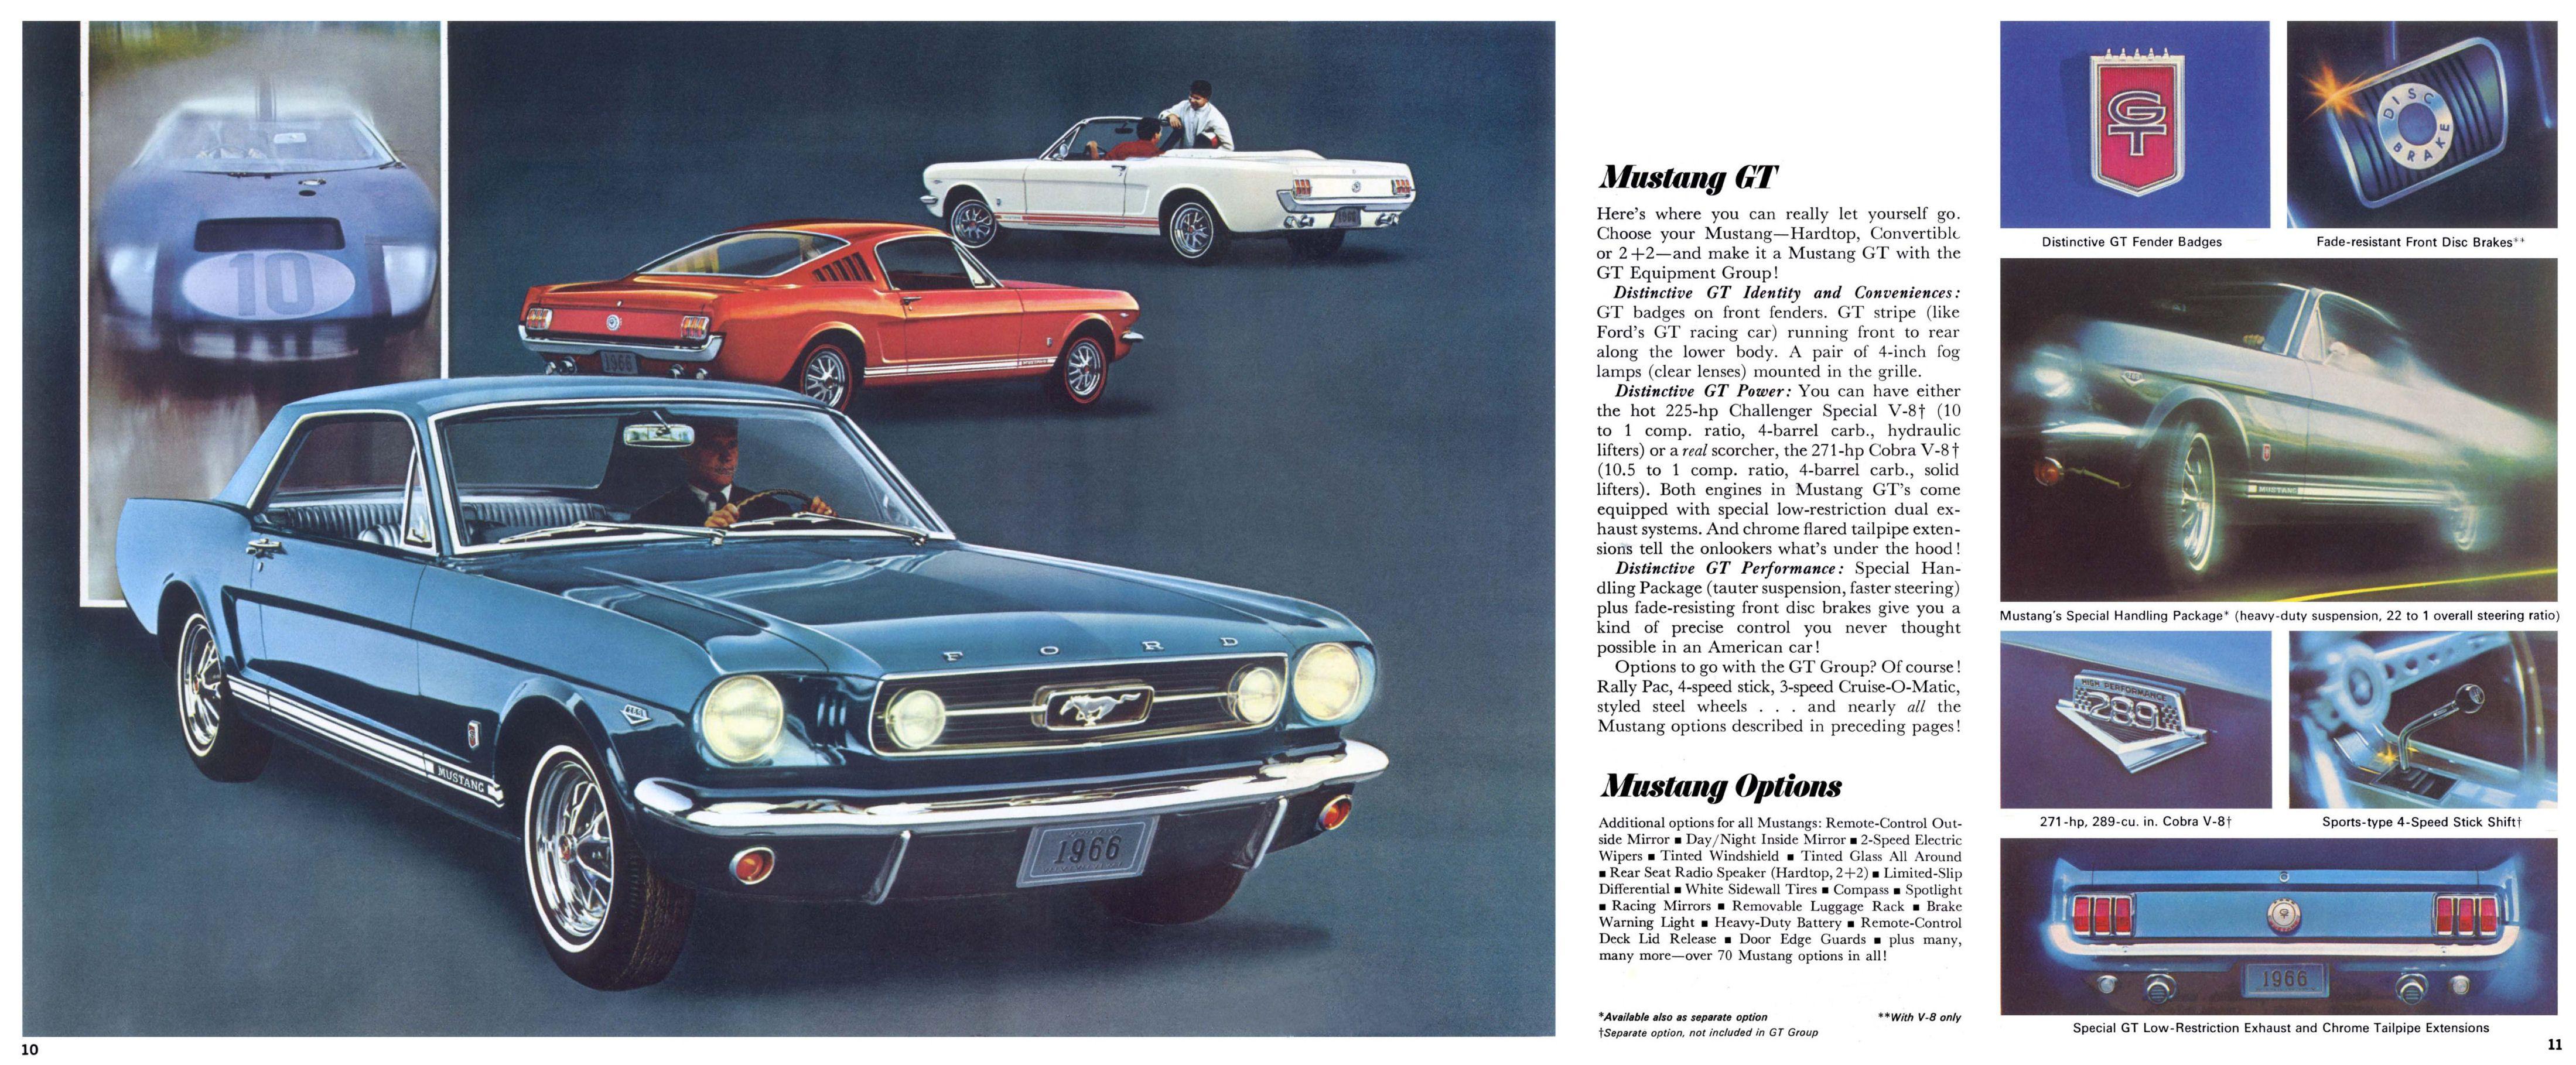 1966 Ford Mustang Brochure 1966 Ford Mustang Mustang Mustang 1966